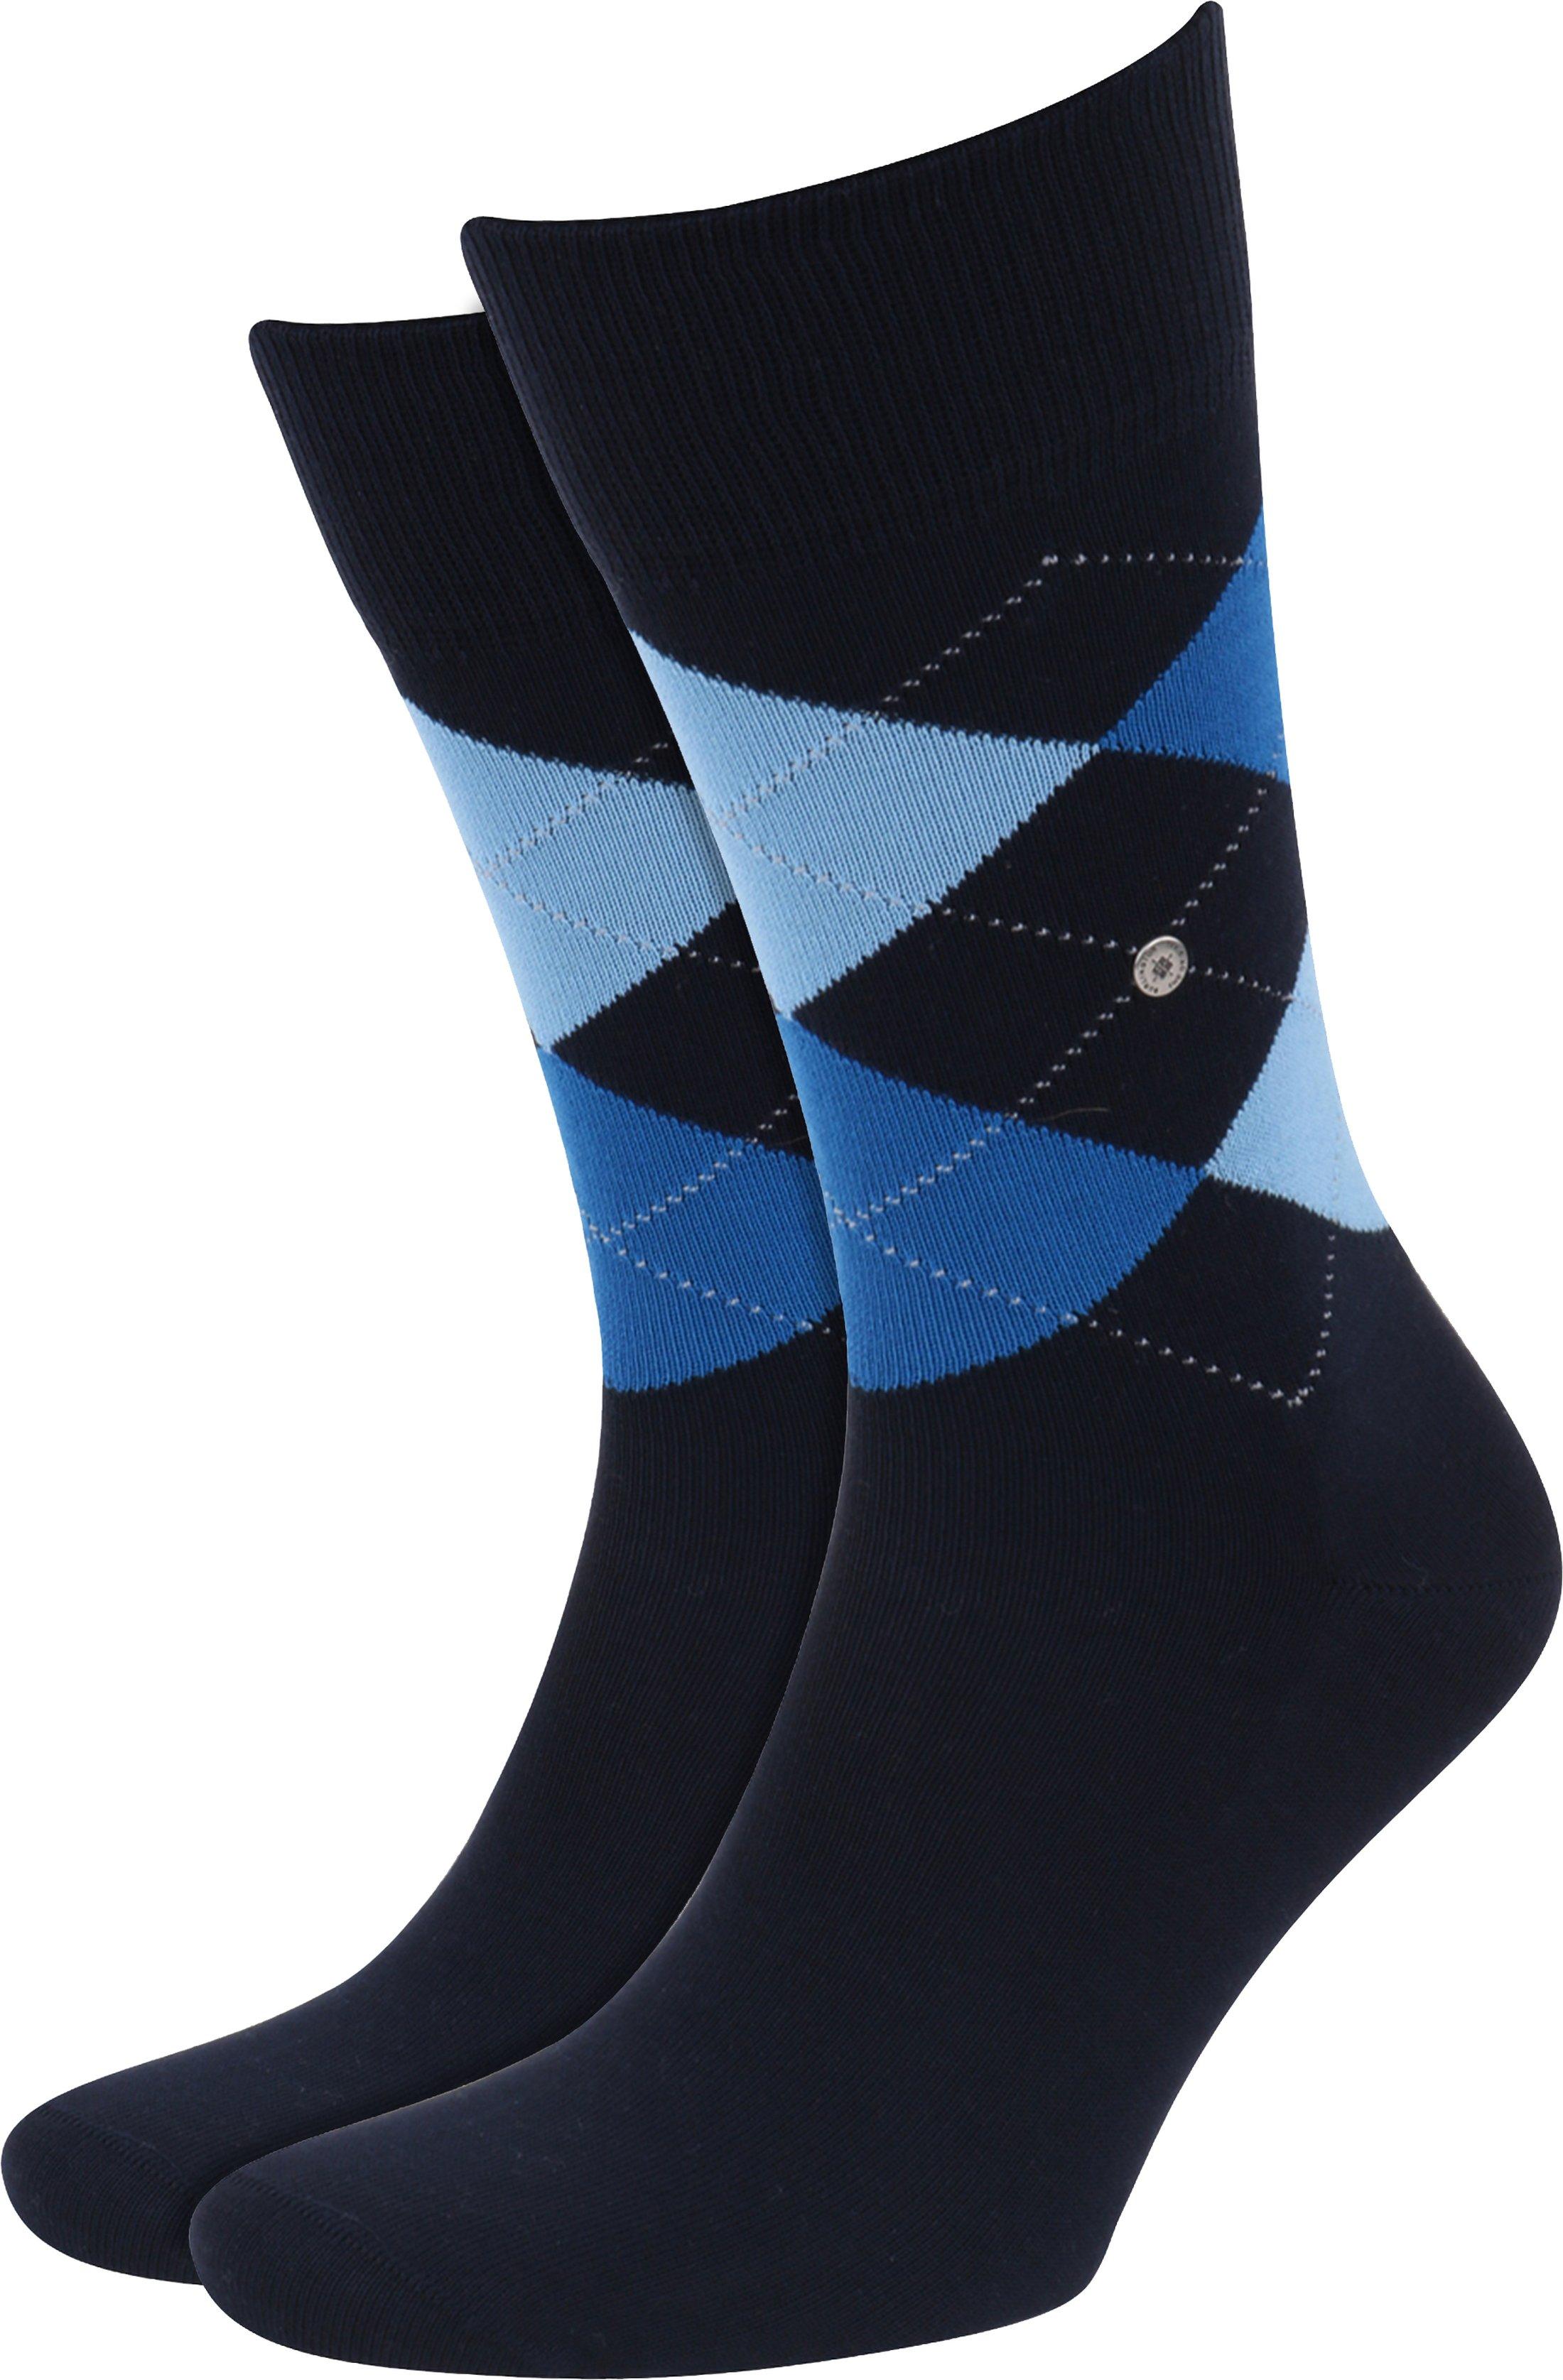 Burlington Socks Checkered Cotton 6120